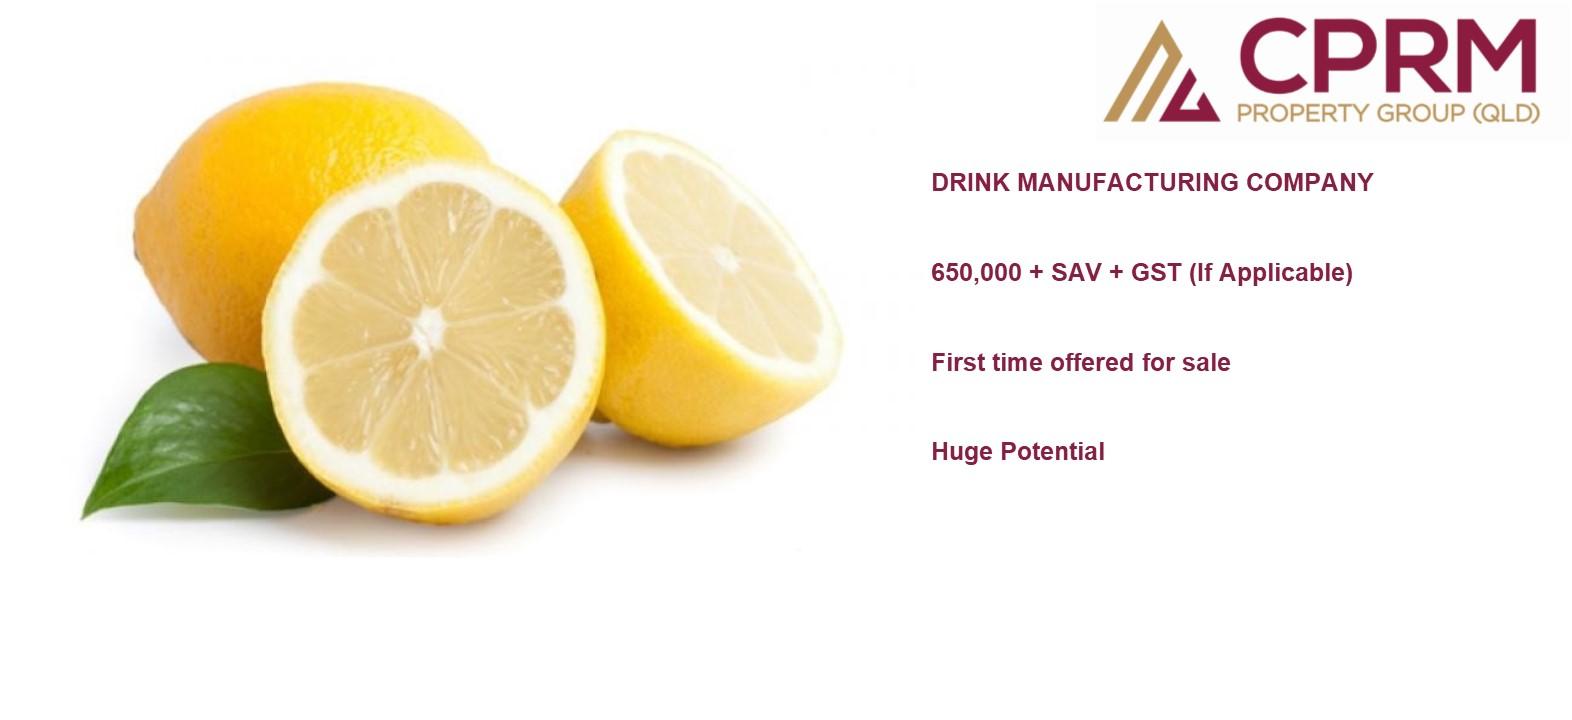 Fruit Juice Company For SALE $650,000